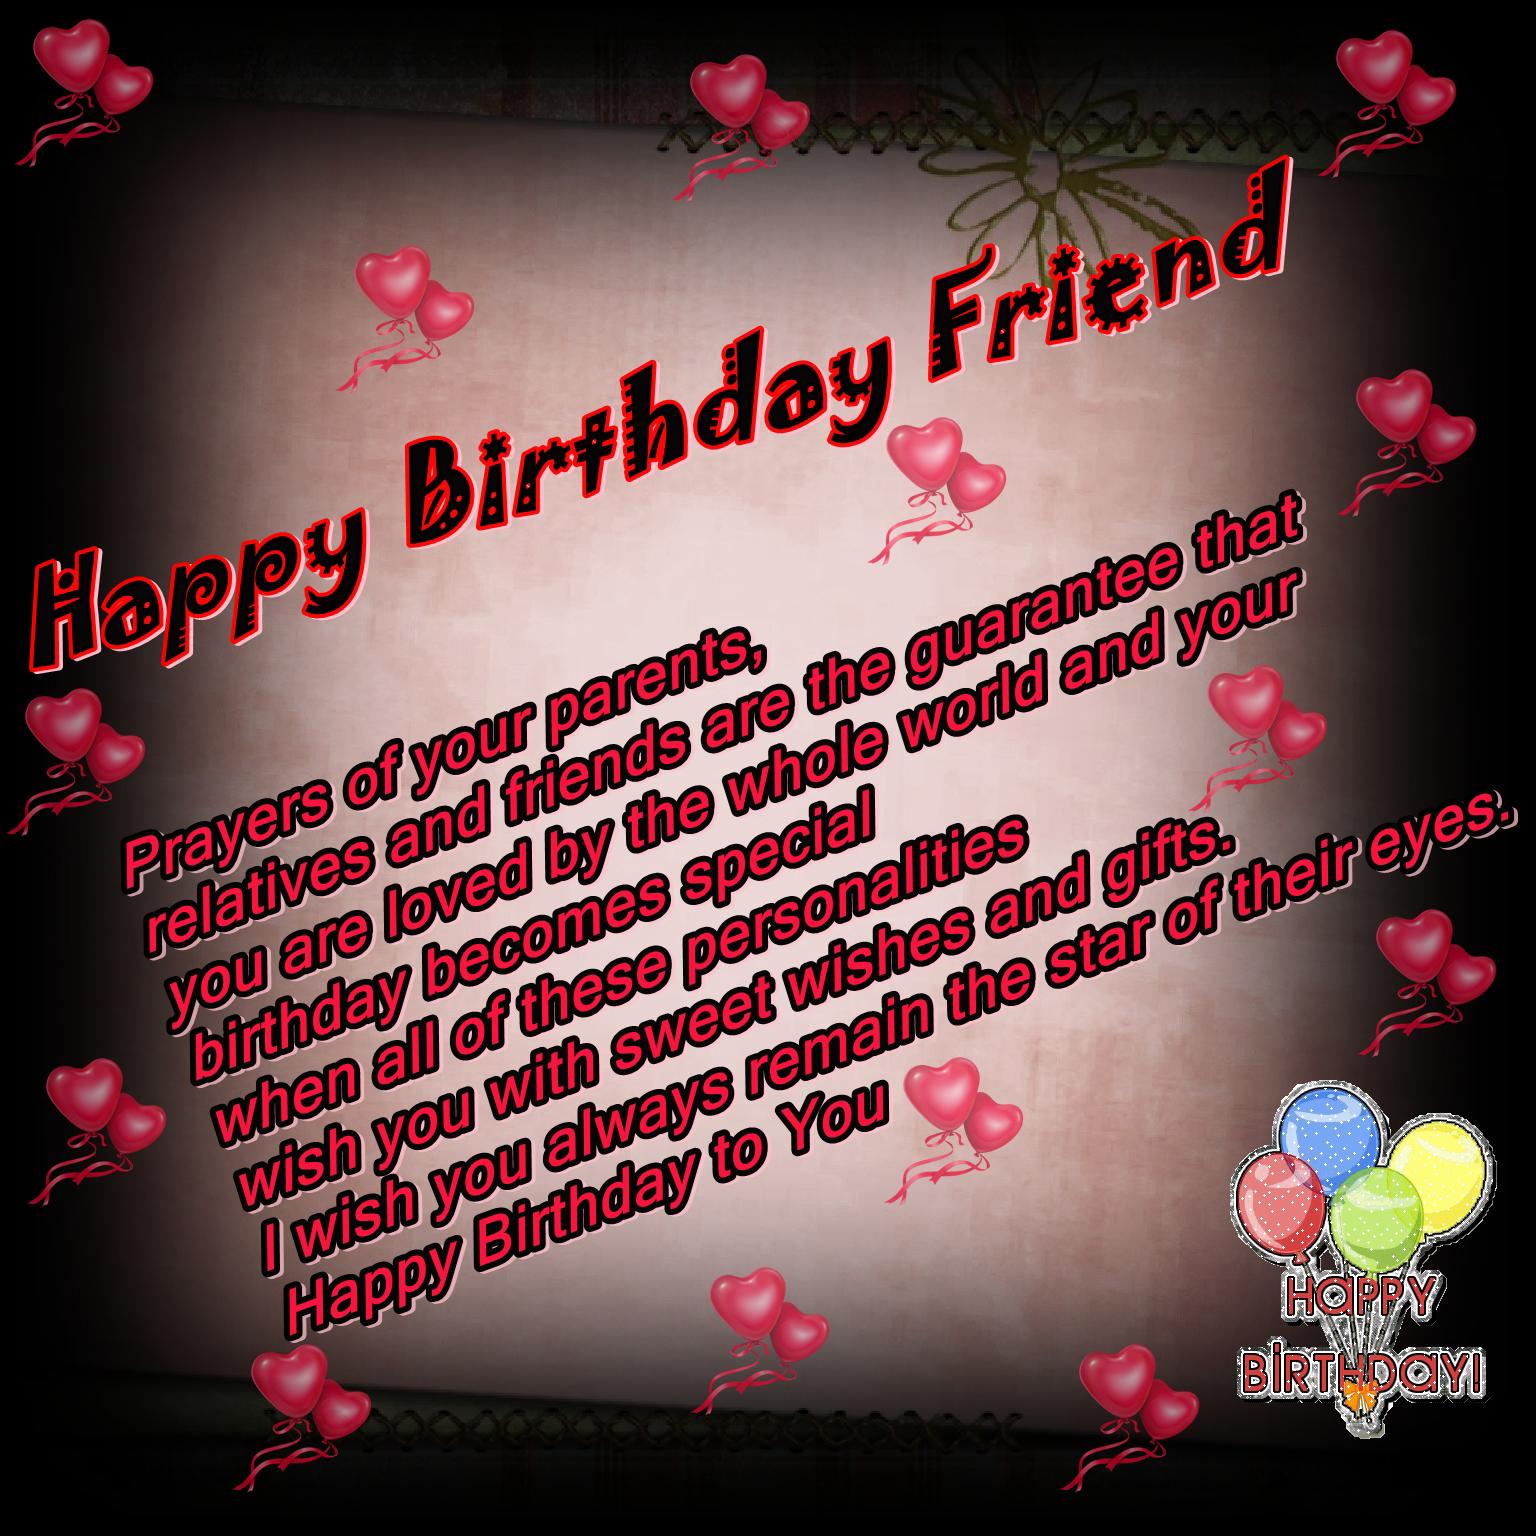 Happy Birthday Friend Images Best Sweet And Beautiful 1536x1536 Wallpaper Teahub Io